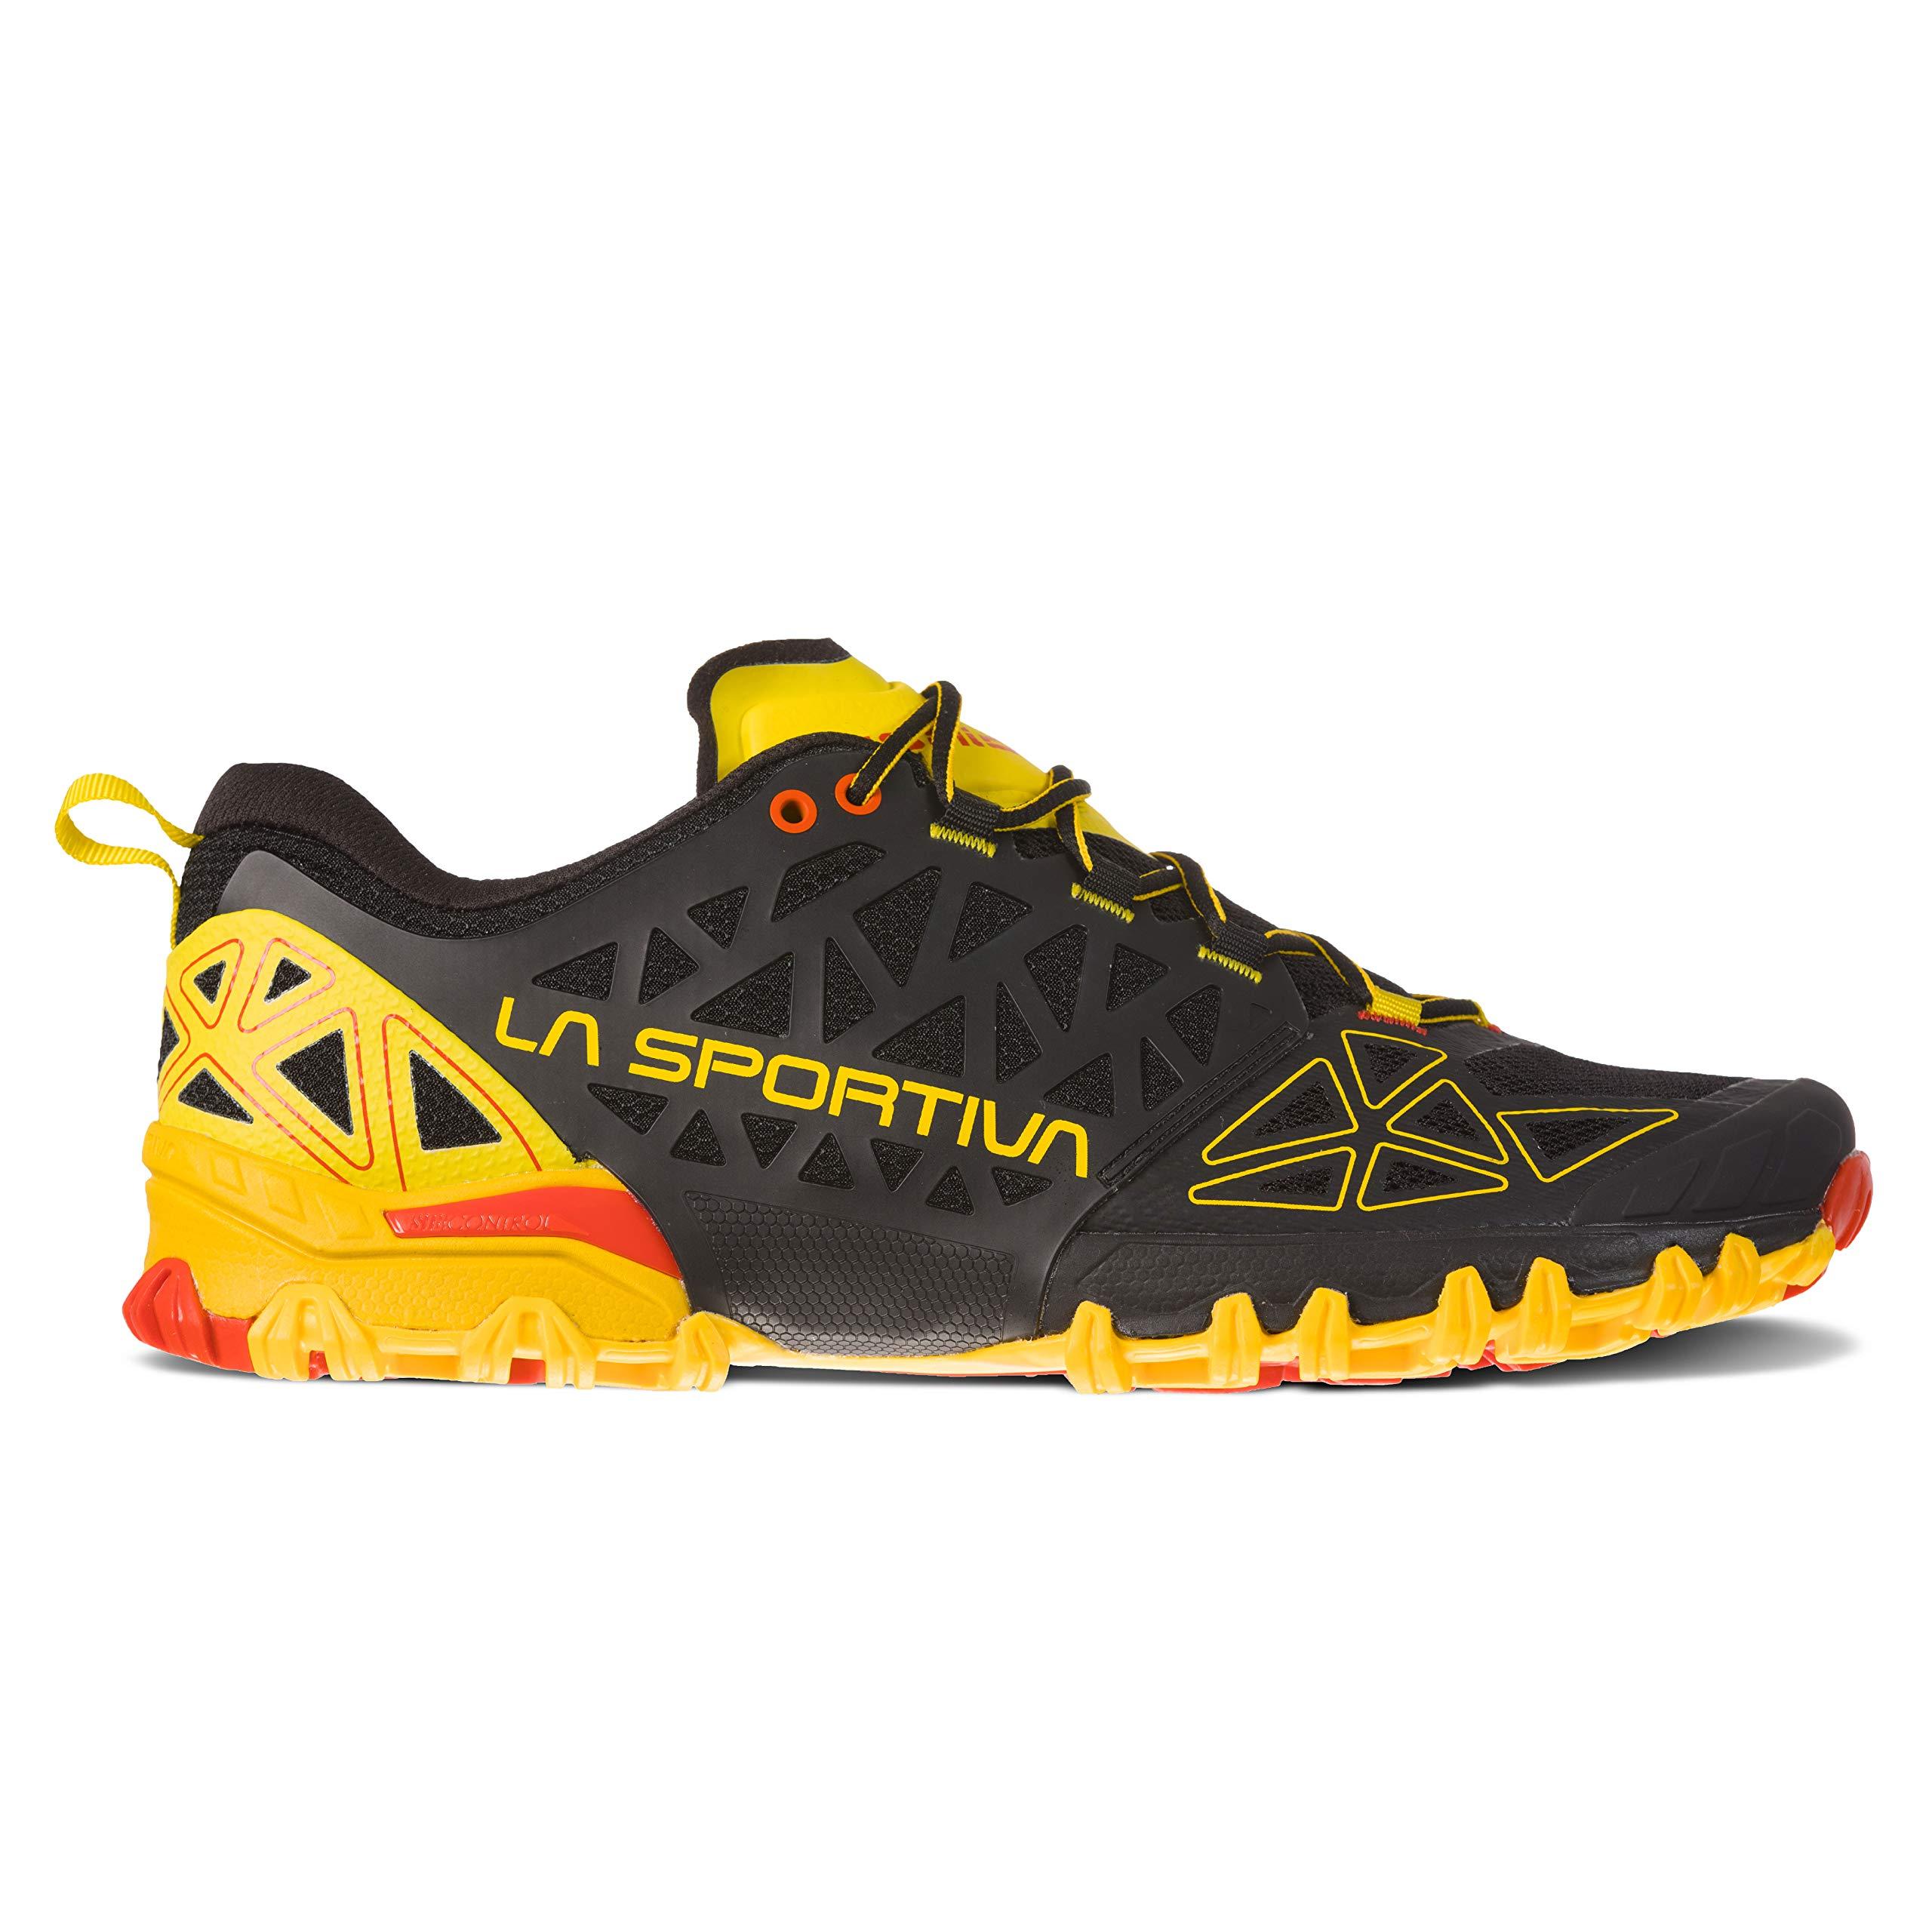 La Sportiva Bushido II Running Shoe, Black/Yellow, 45